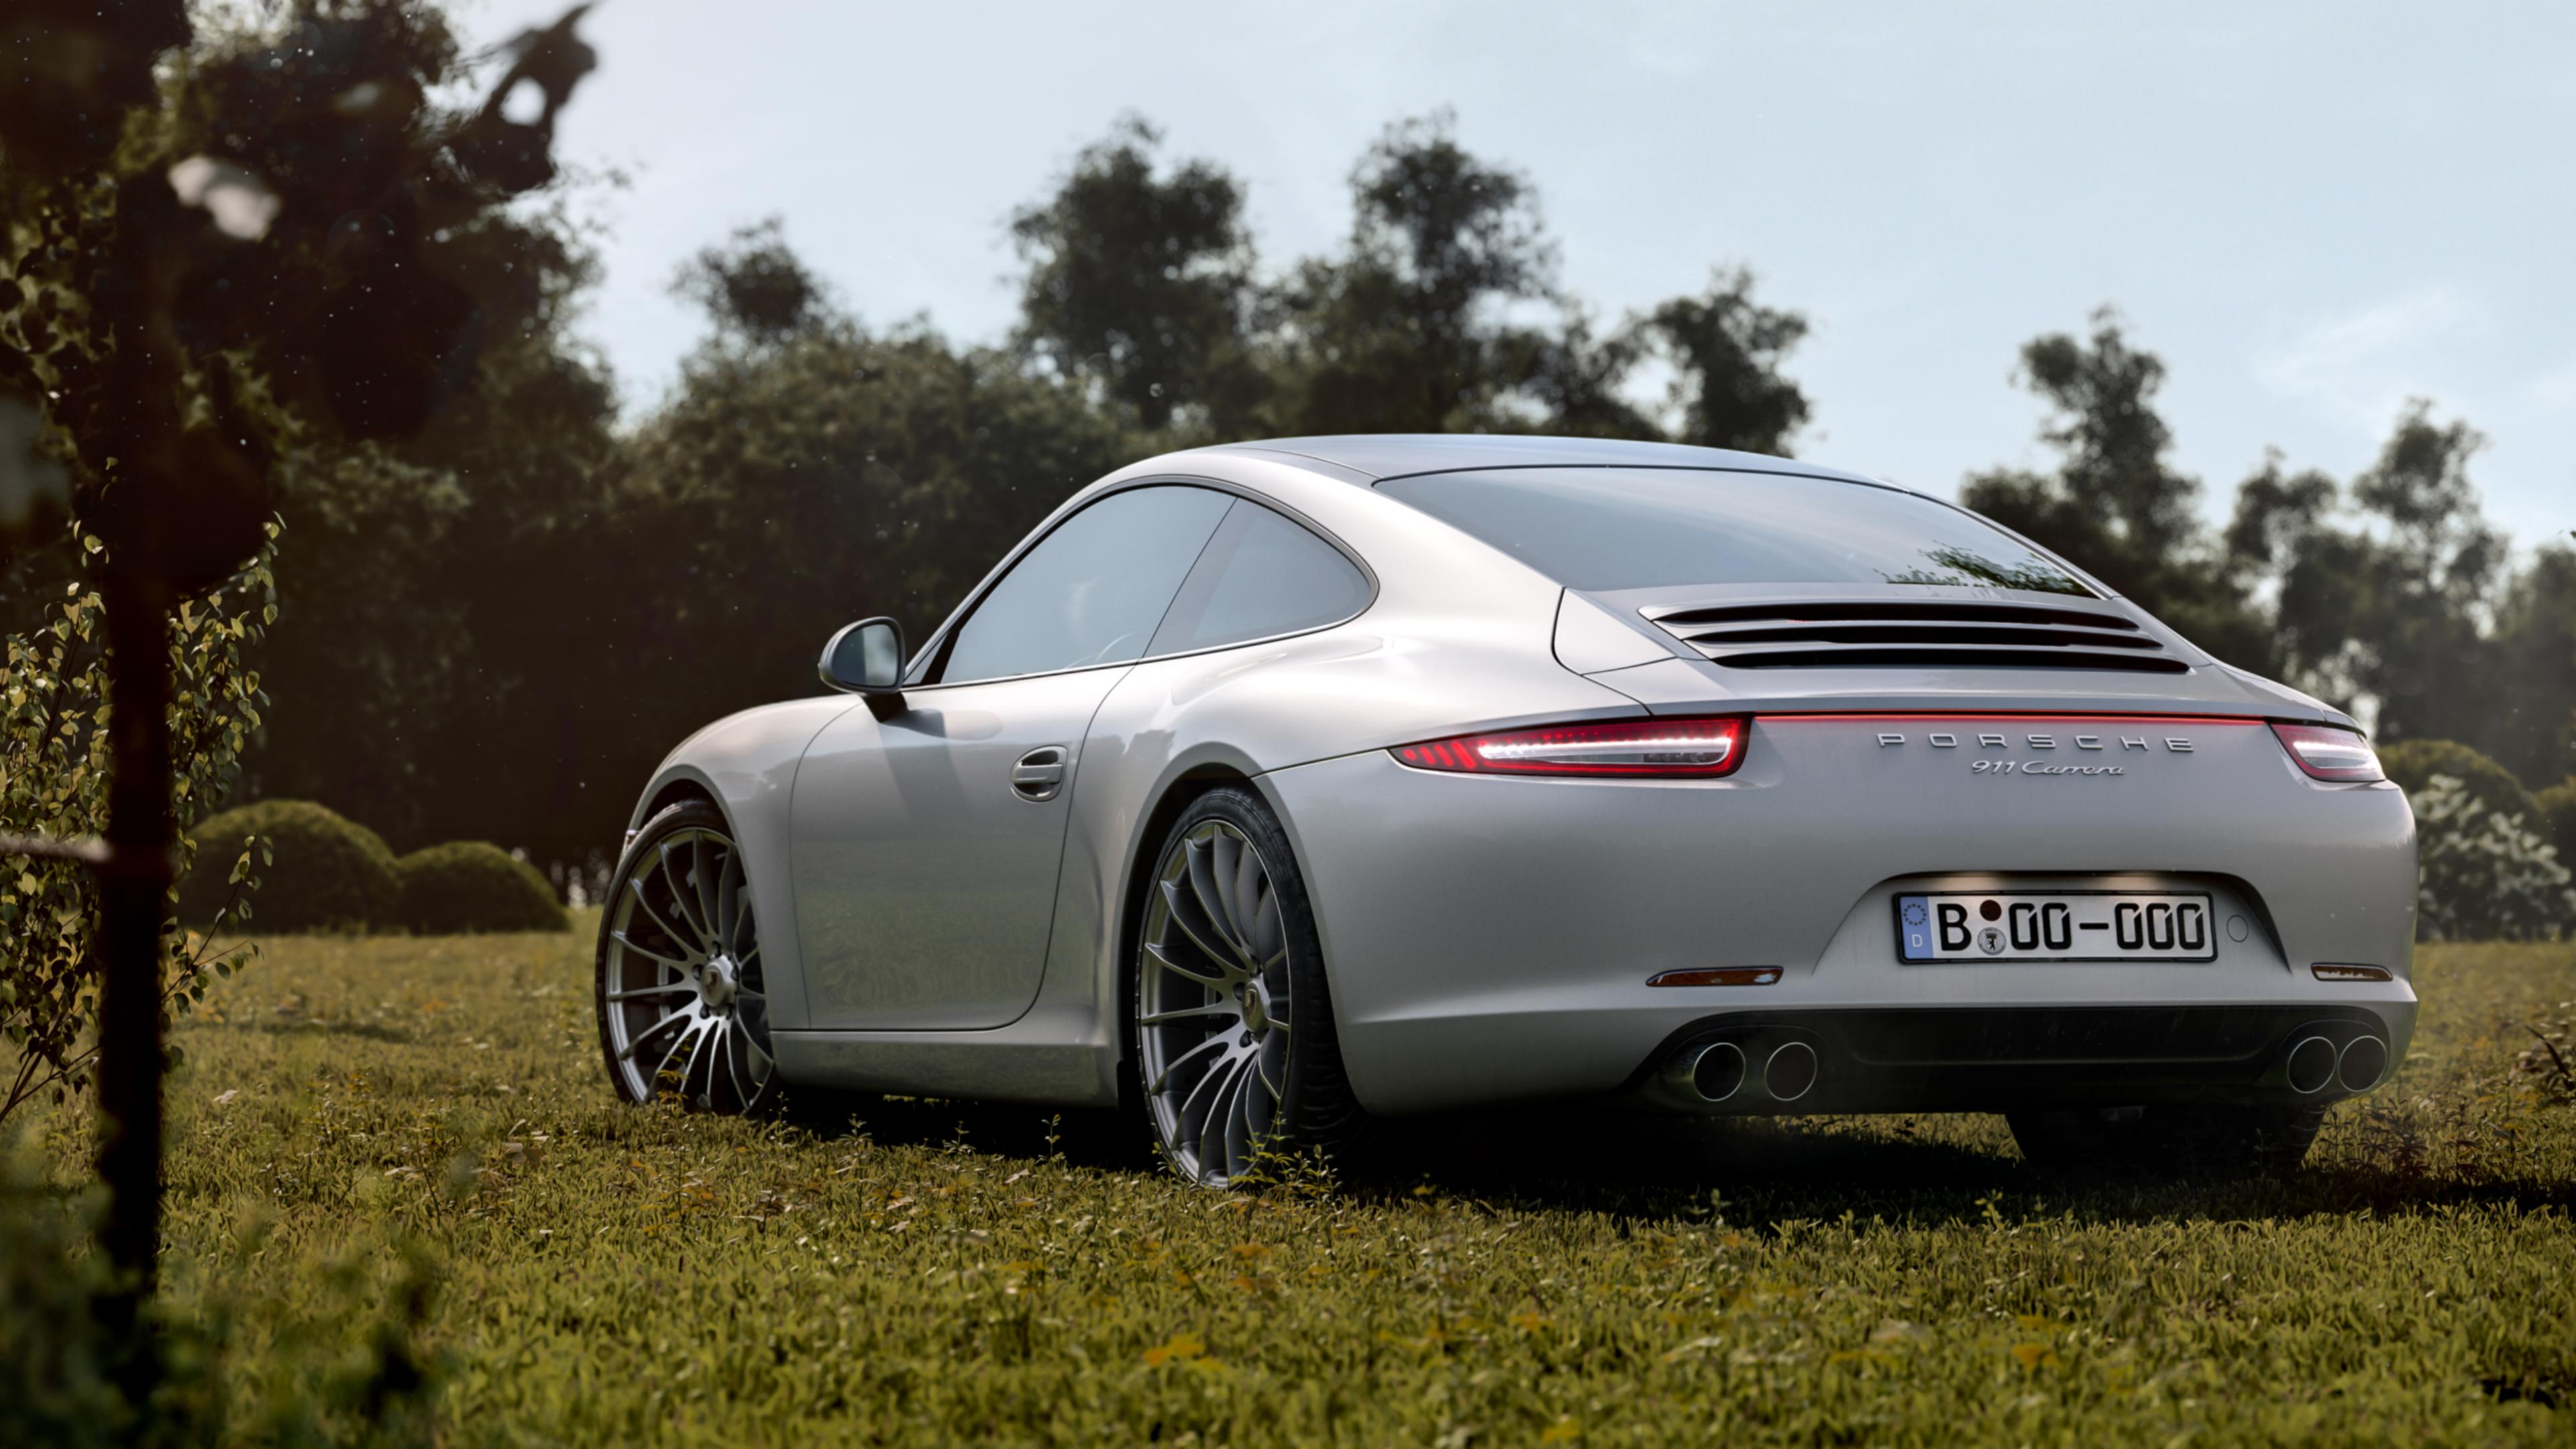 porsche 911 carrera rear 4k 1546361538 - Porsche 911 Carrera Rear 4k - porsche carrera wallpapers, hd-wallpapers, cars wallpapers, behance wallpapers, artist wallpapers, 4k-wallpapers